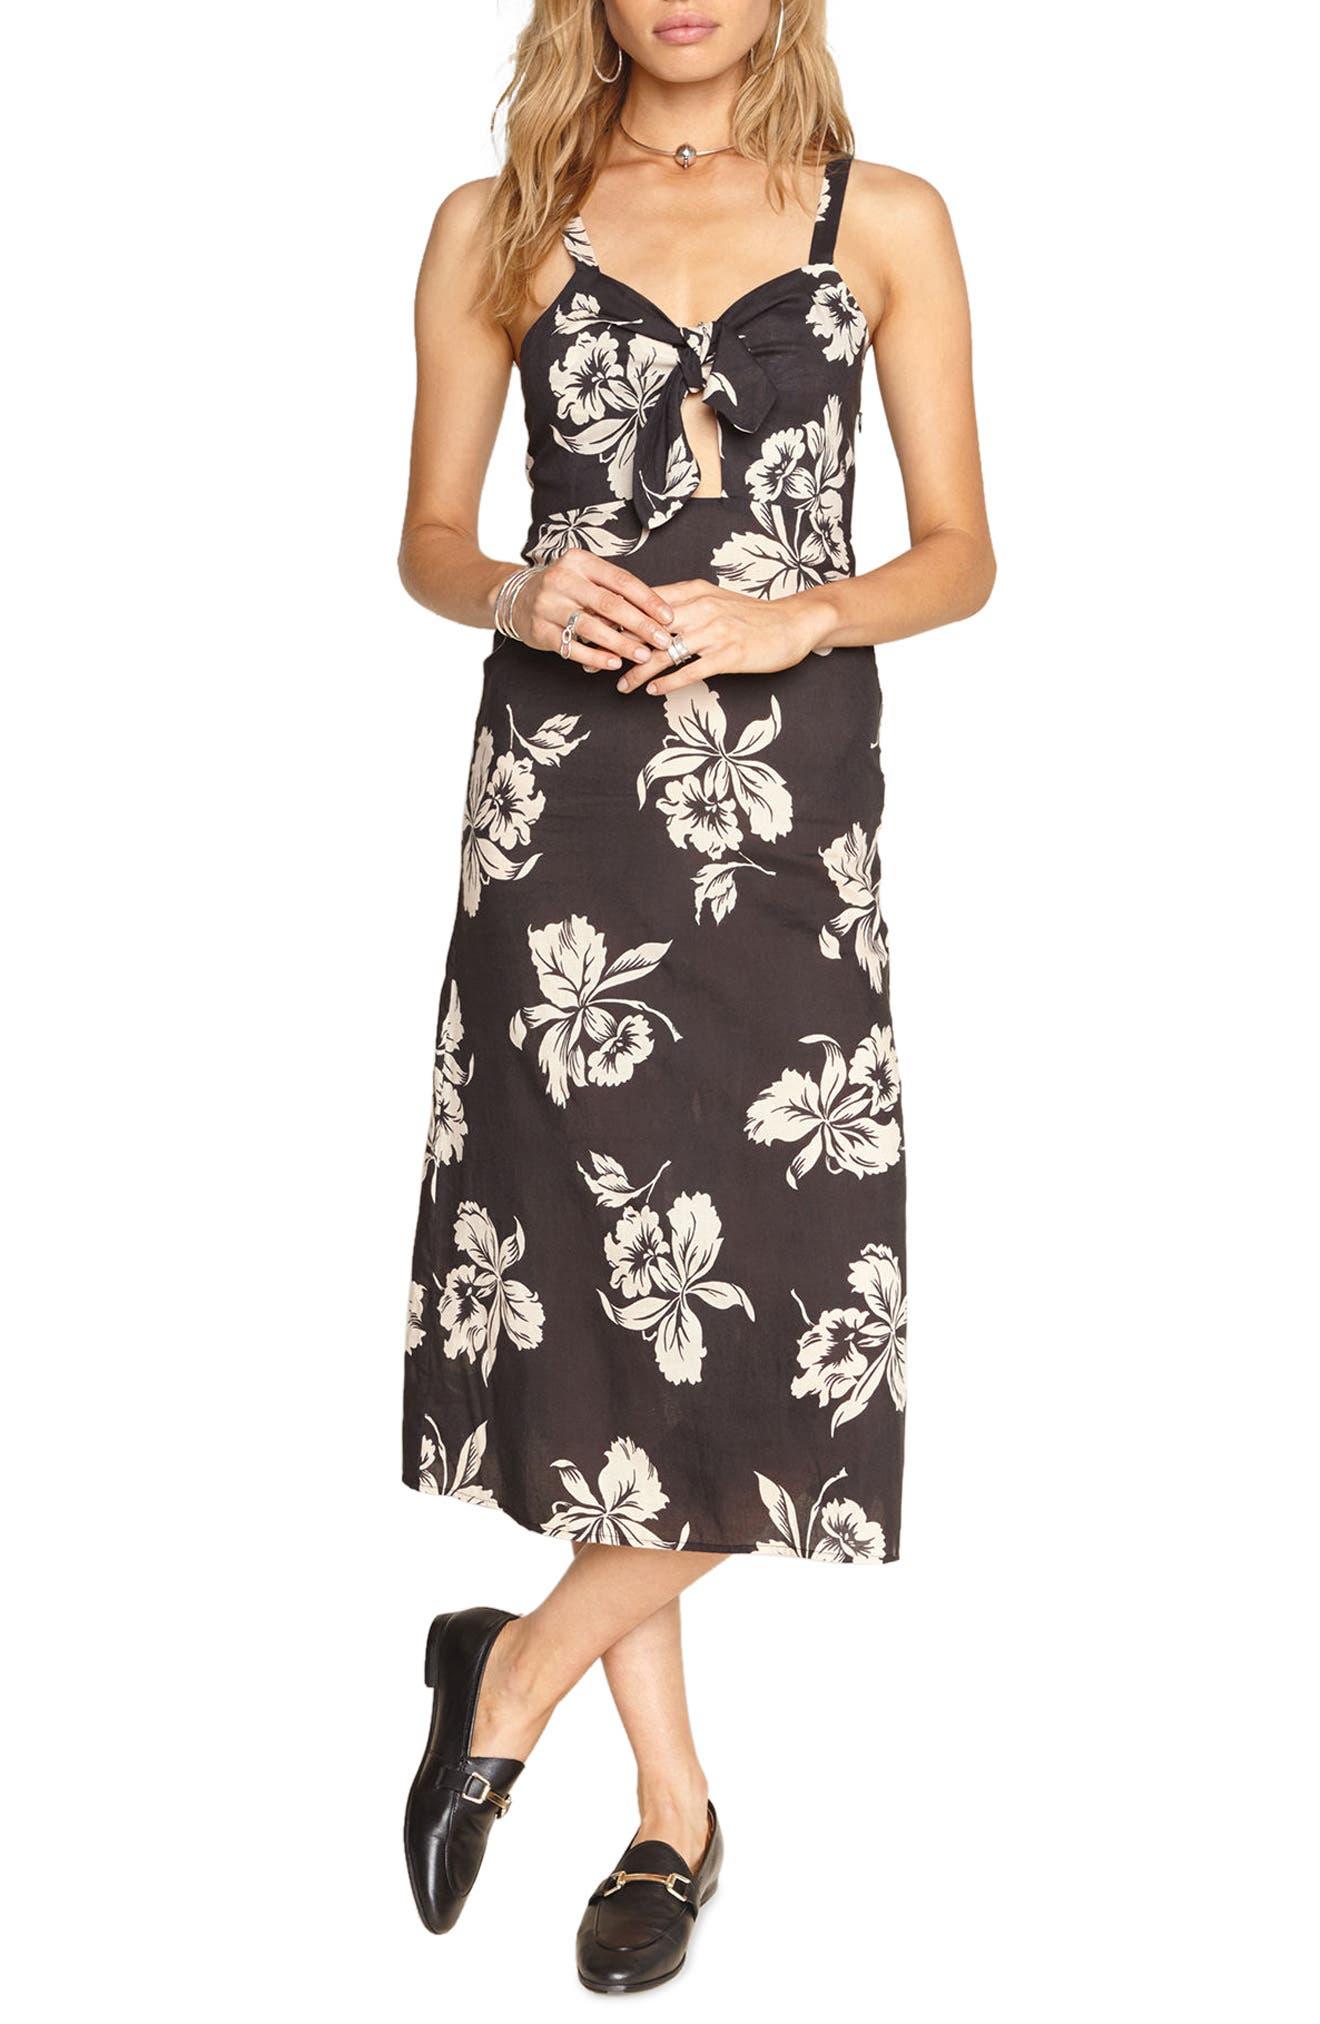 Main Image - Amuse Society Maude Tie Front Midi Dress